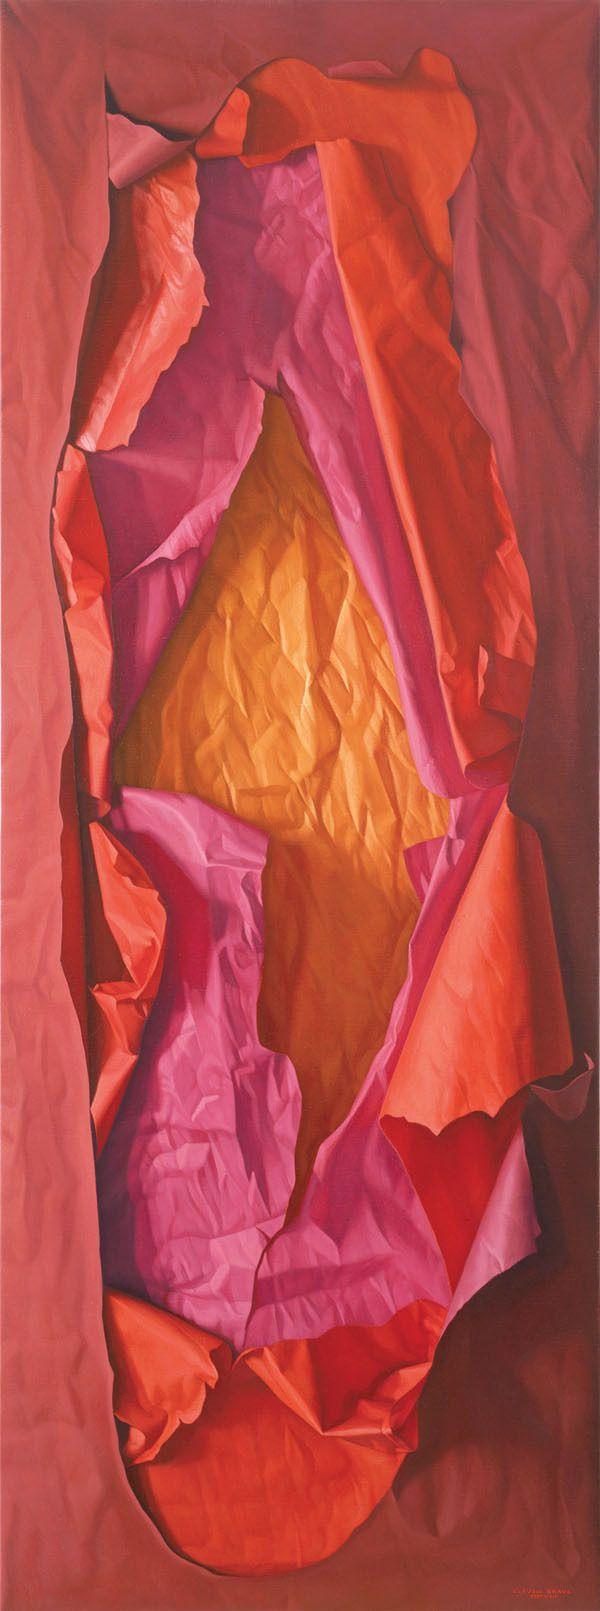 "Claudio Bravo: ""Red, Rose and Orange Paper"", 2008. Oil on canvas."